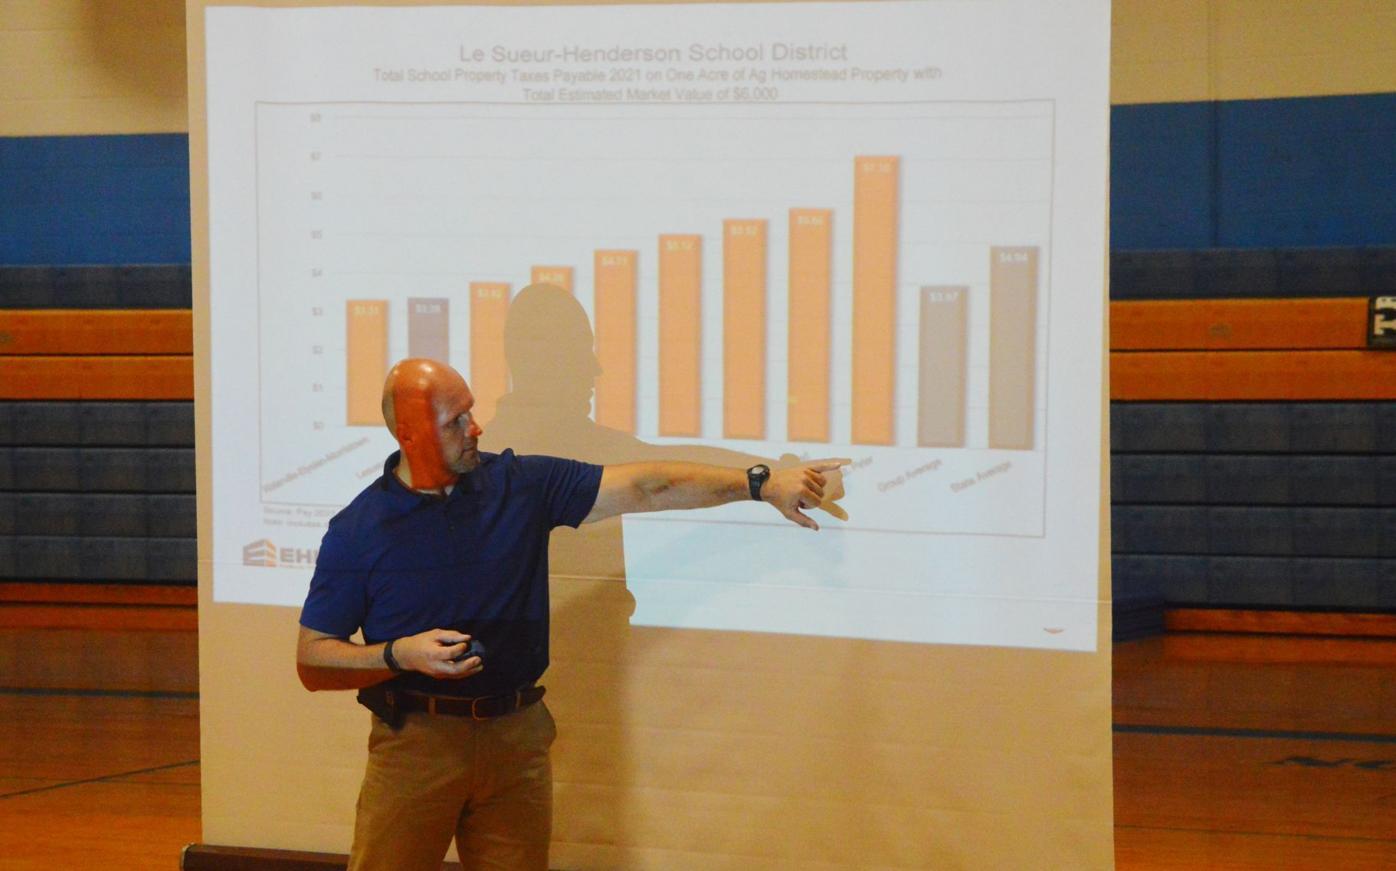 Jim Wagner presentation